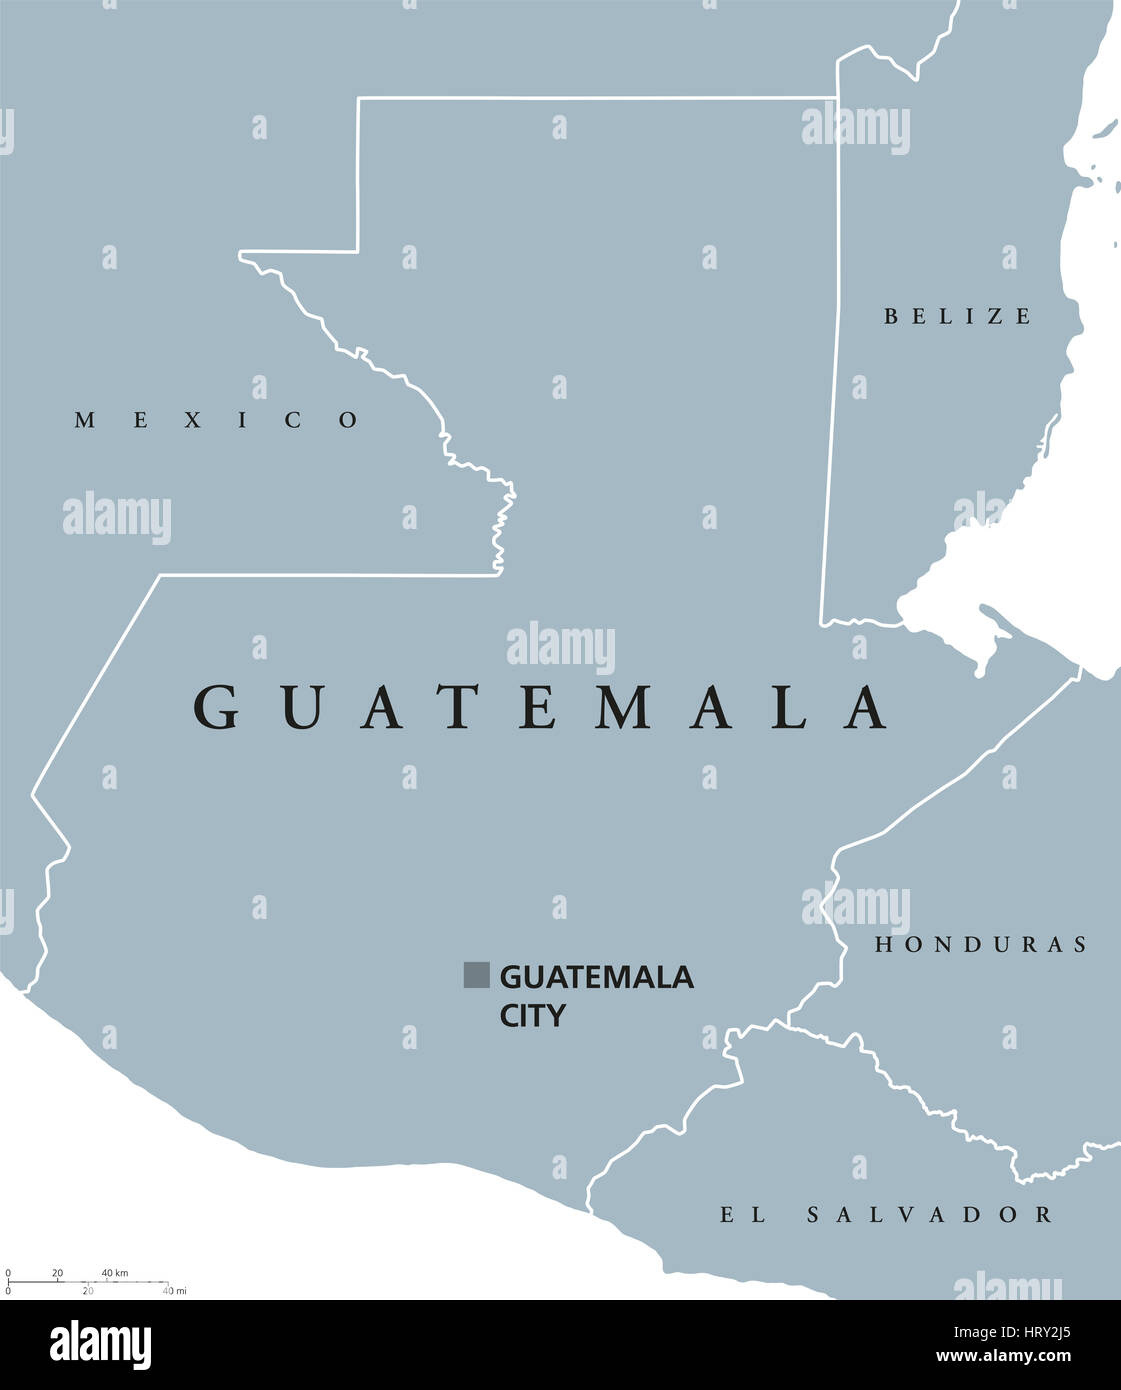 Guatemala Map Stockfotos & Guatemala Map Bilder - Alamy on